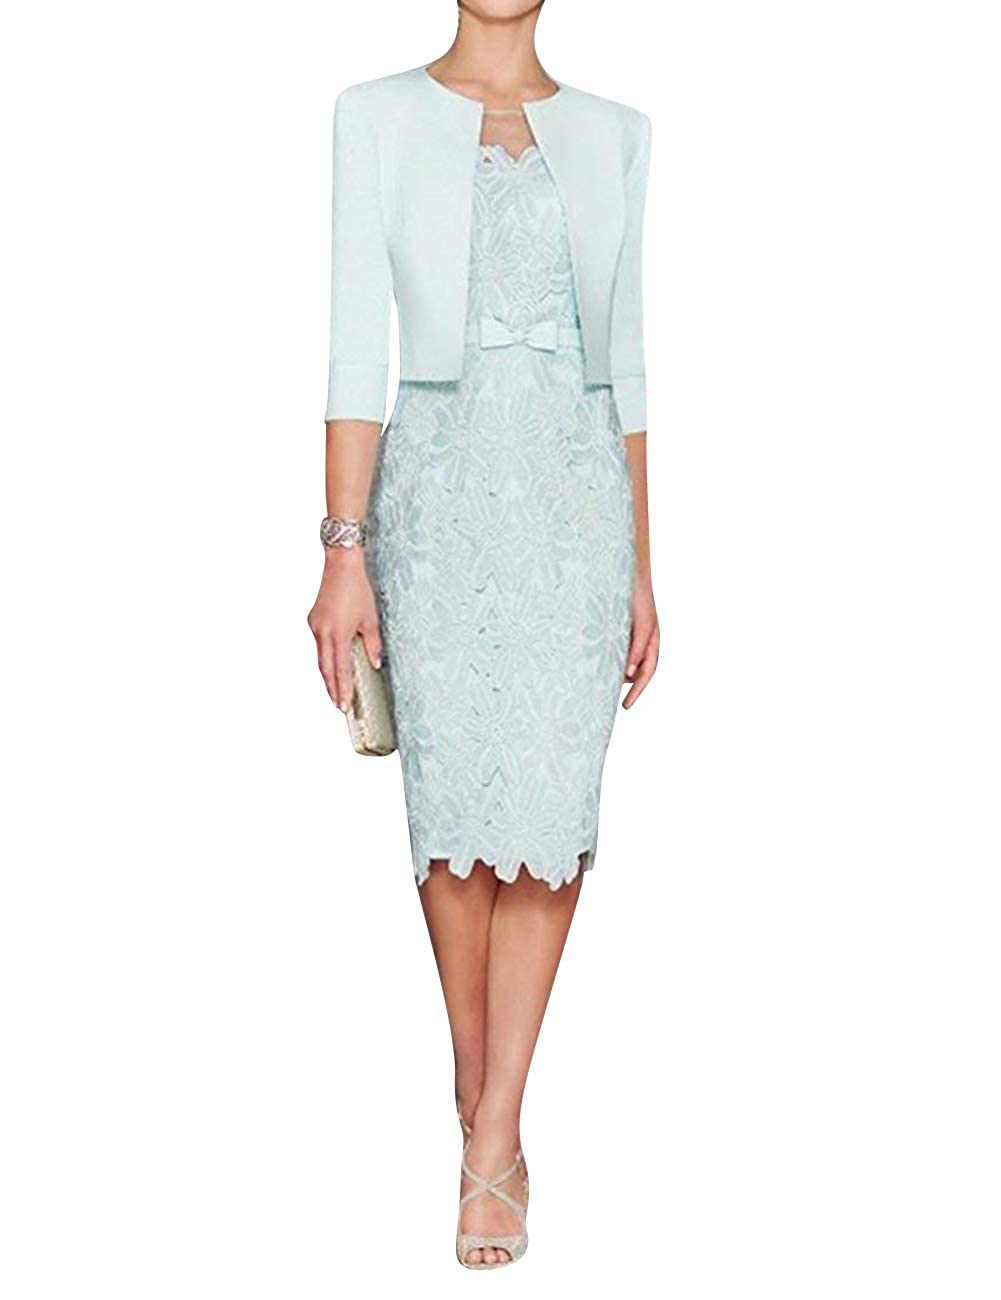 Sky bluee H.S.D Mother of The Bride Dress Sheath Mother Dress Lace Formal Dresses Satin Jacket